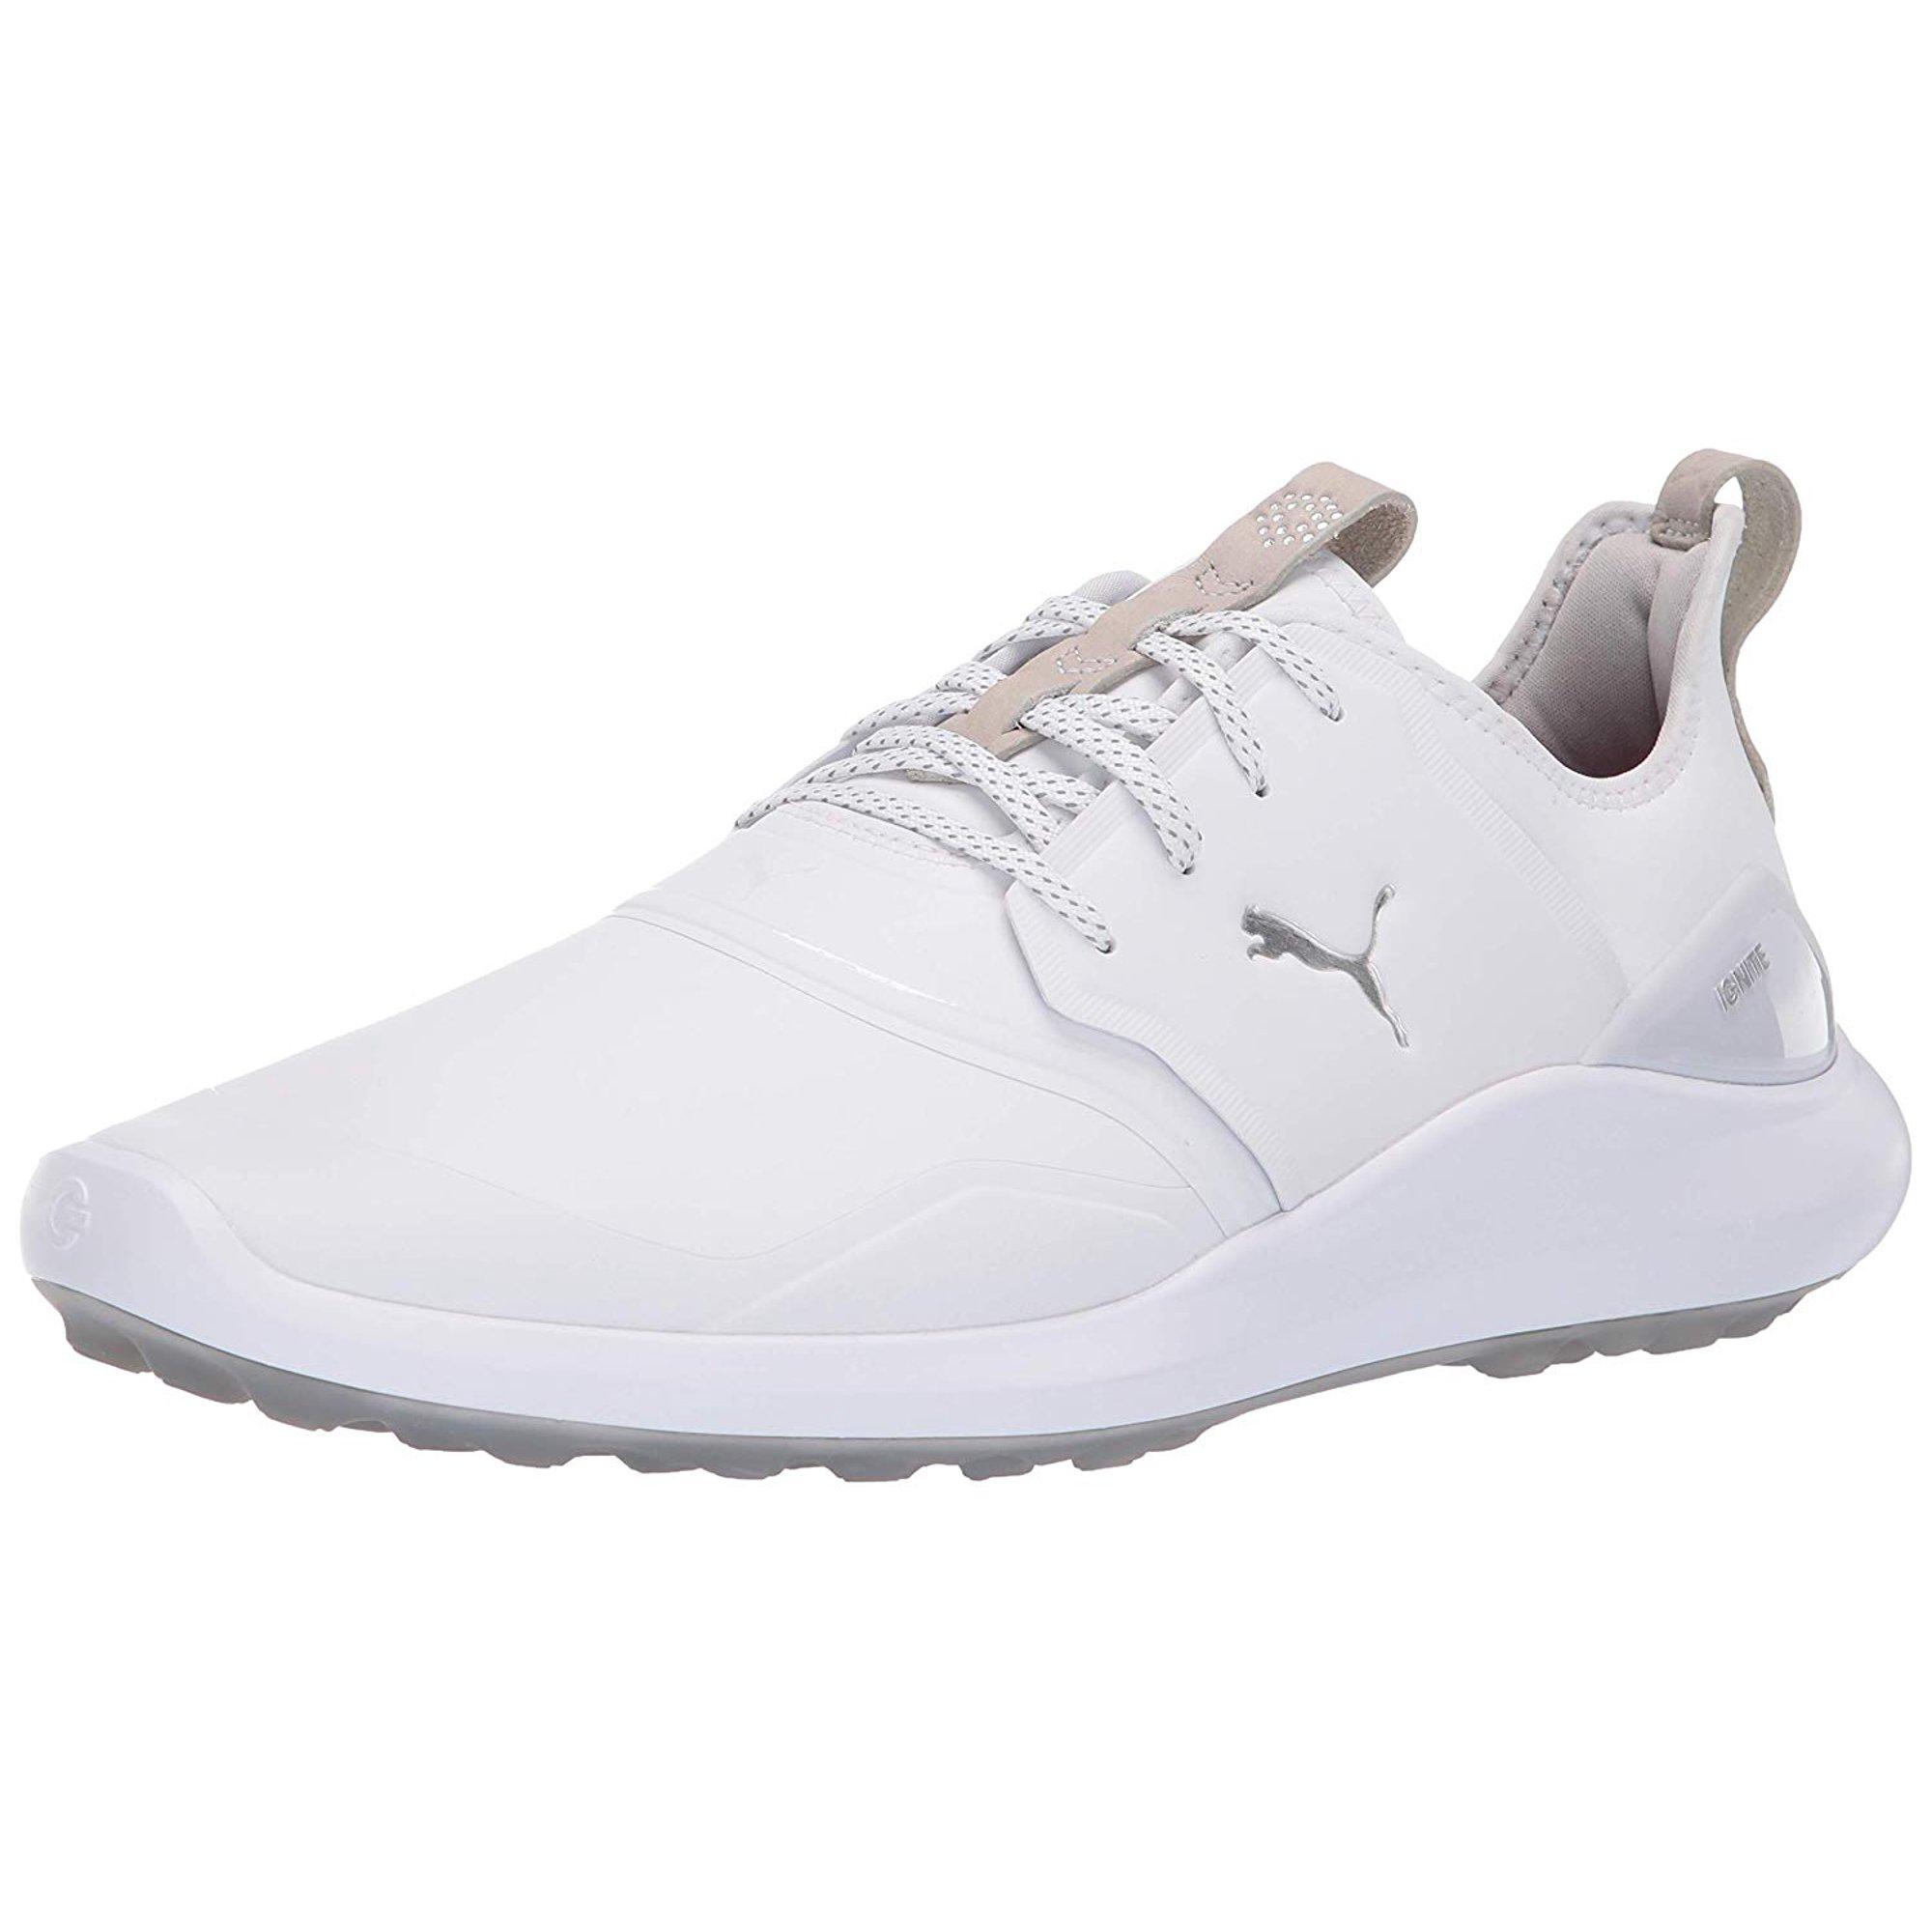 Puma Men S Ignite Nxt Pro Golf Shoe Walmart Canada